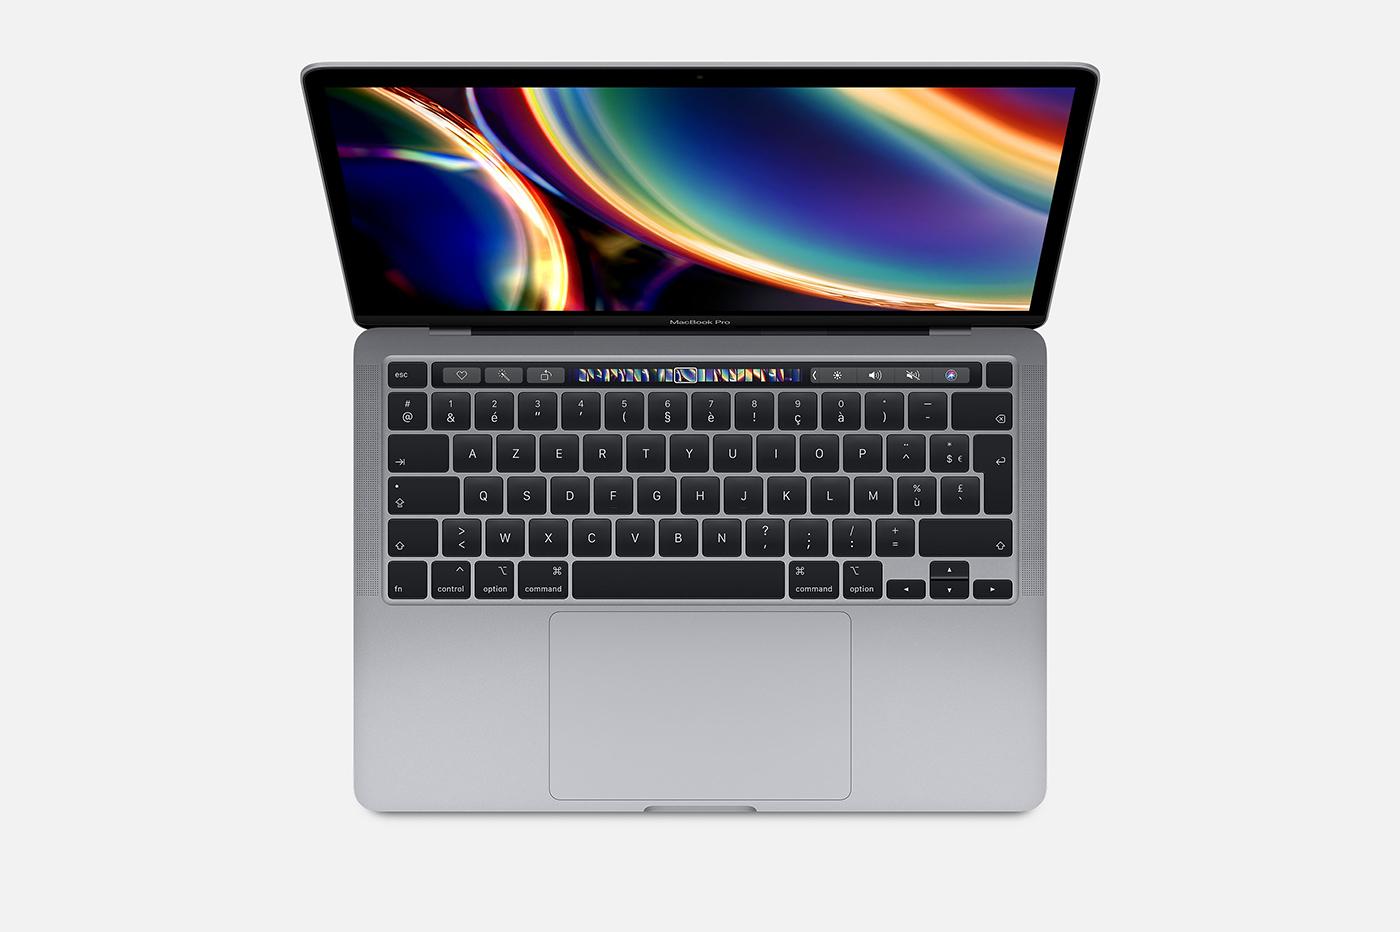 Quels sont les changements apportés par macOS Catalina 10.15.5 ?